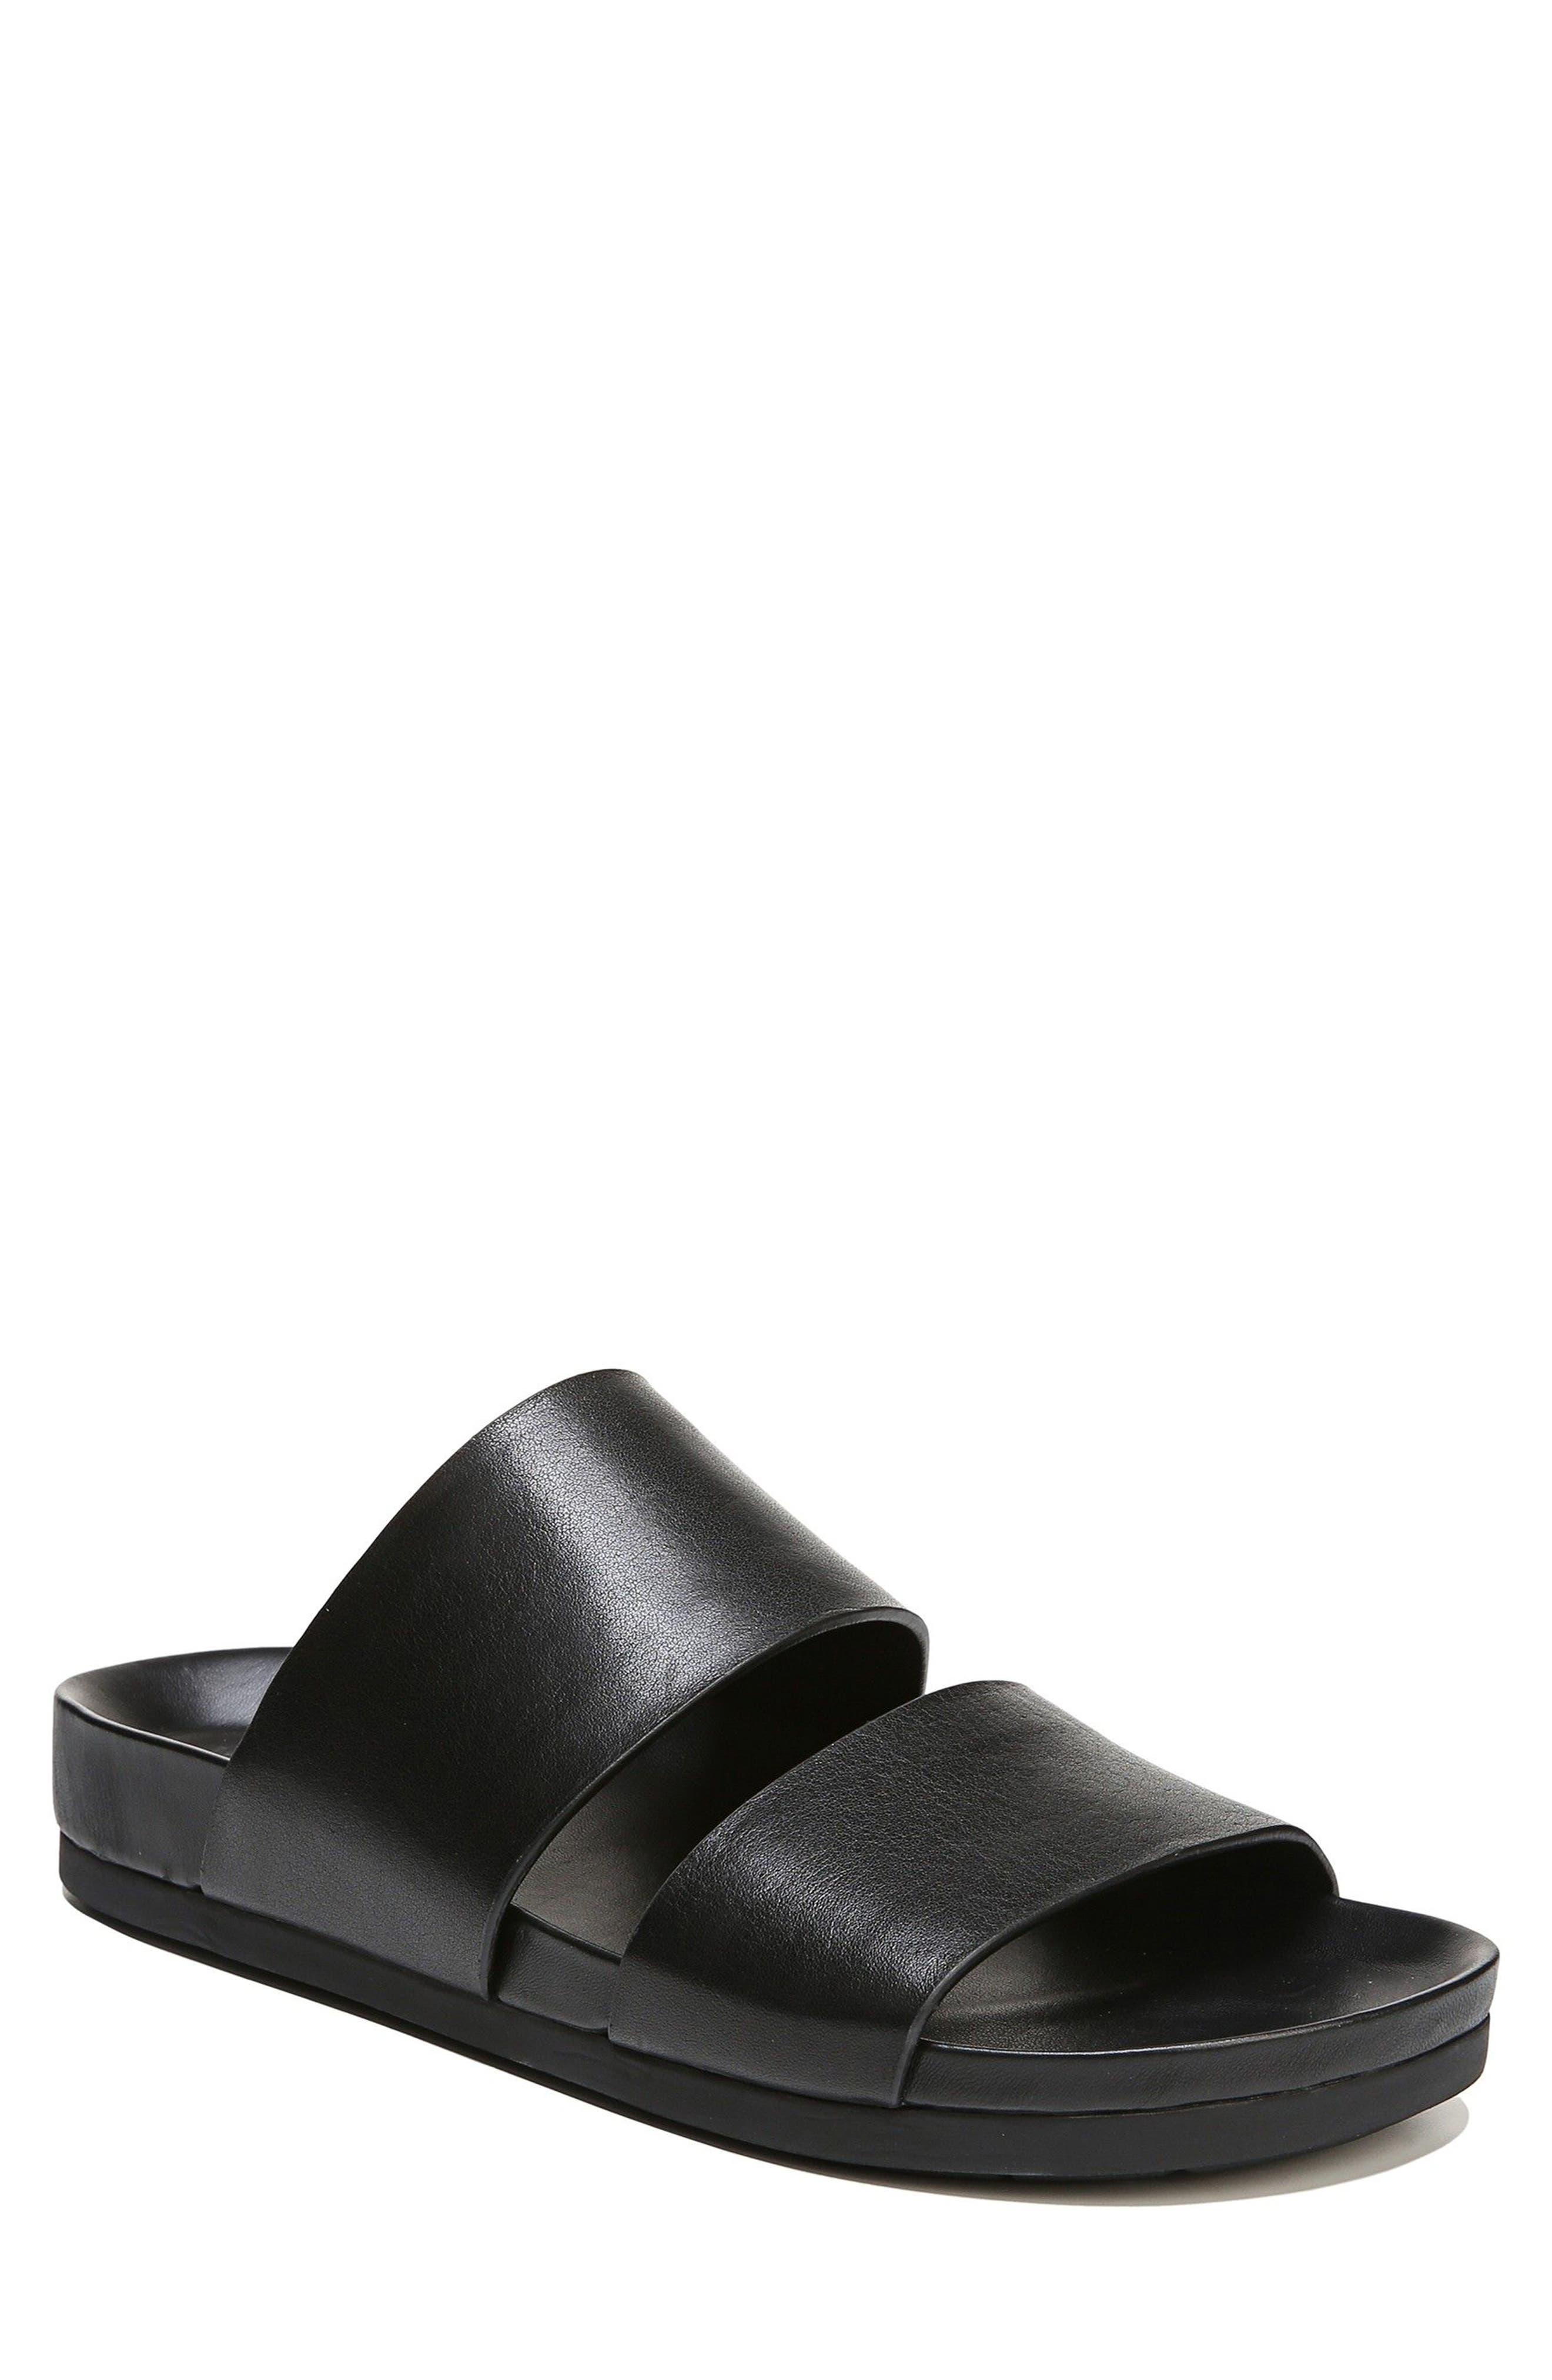 Malibu Slide Sandal,                             Main thumbnail 1, color,                             Black